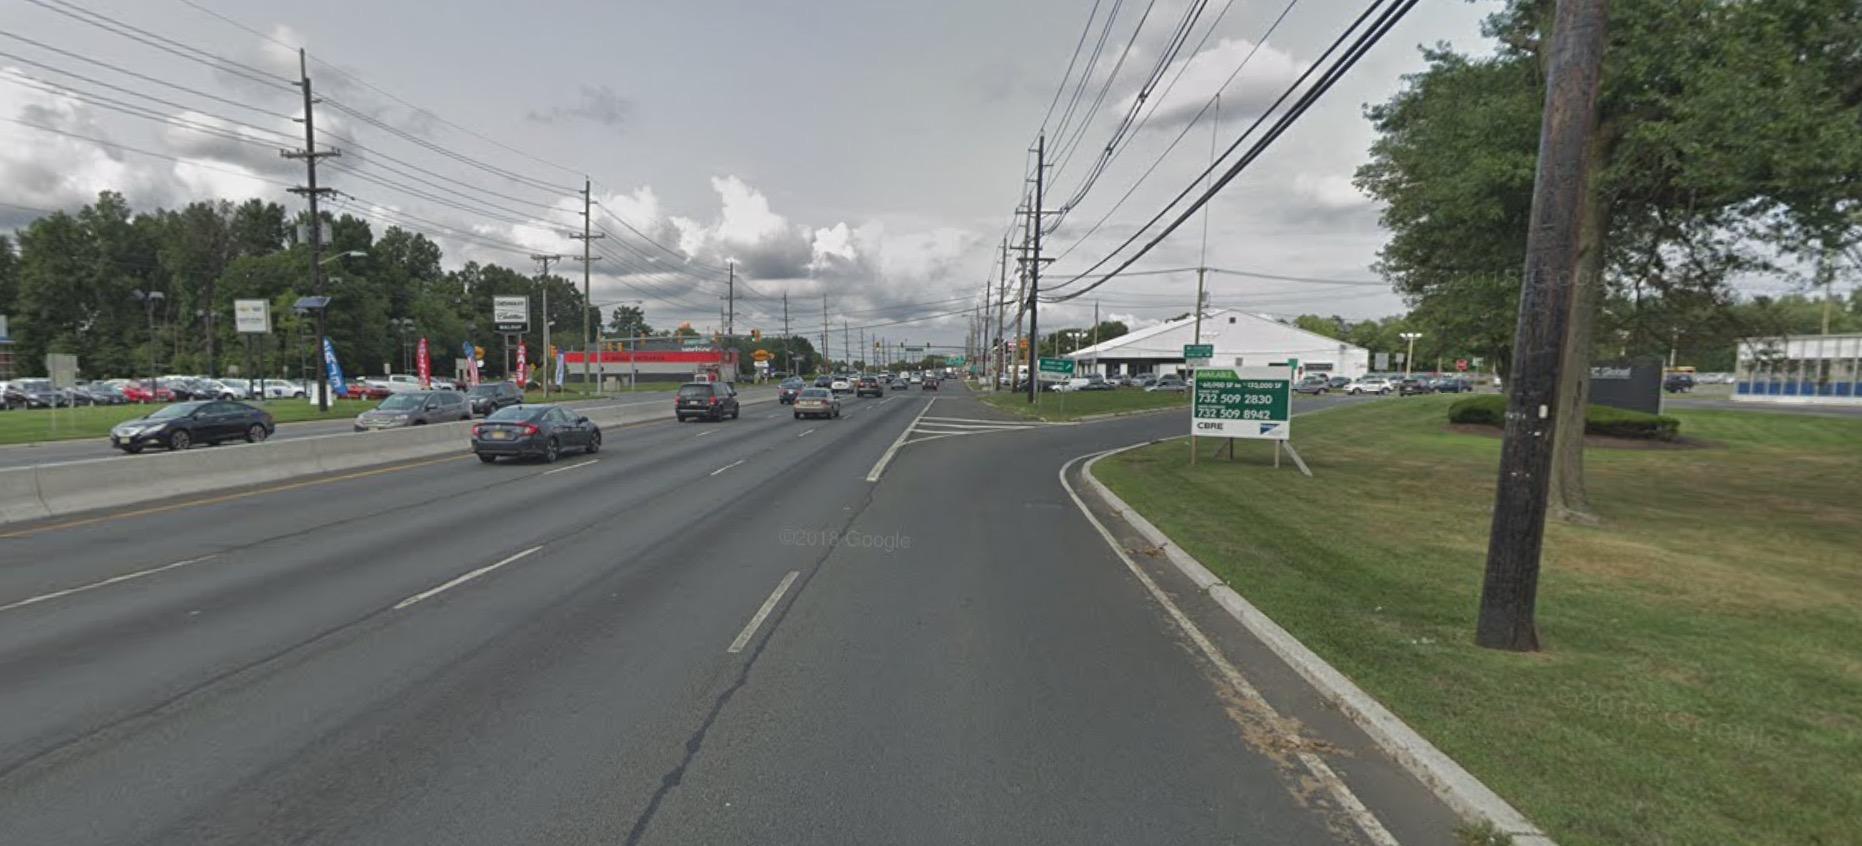 Tesla Autopilot crash google street view